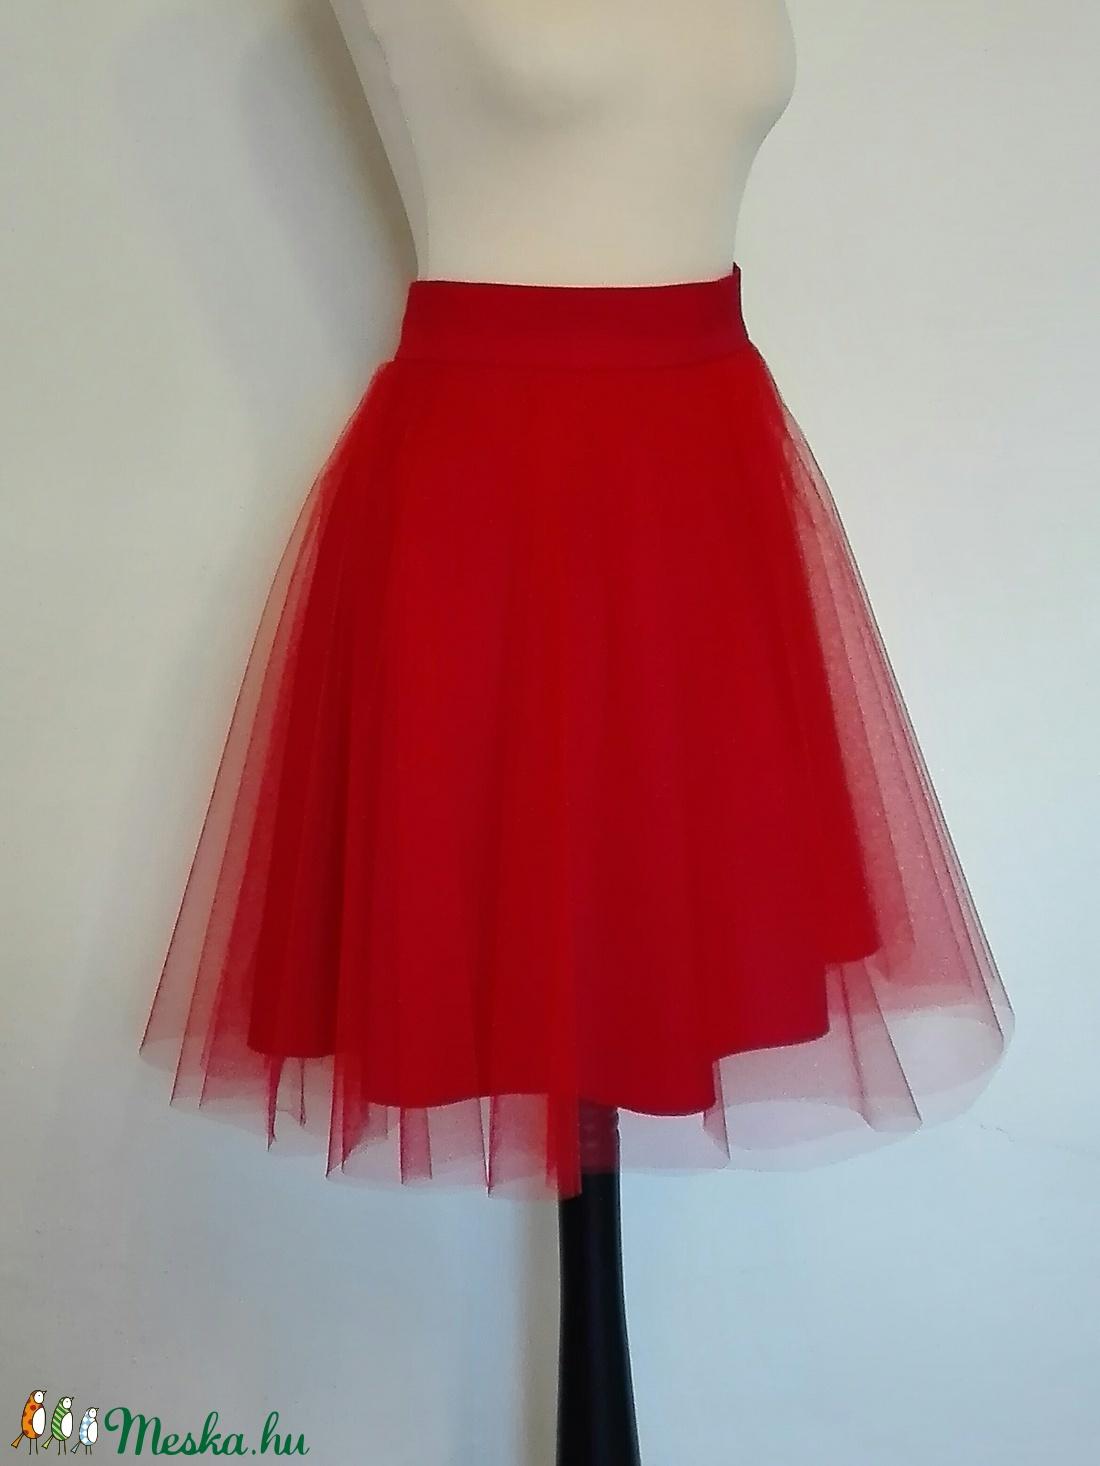 Piros tüll szoknya (nicoledesign) - Meska.hu f78f7523d5